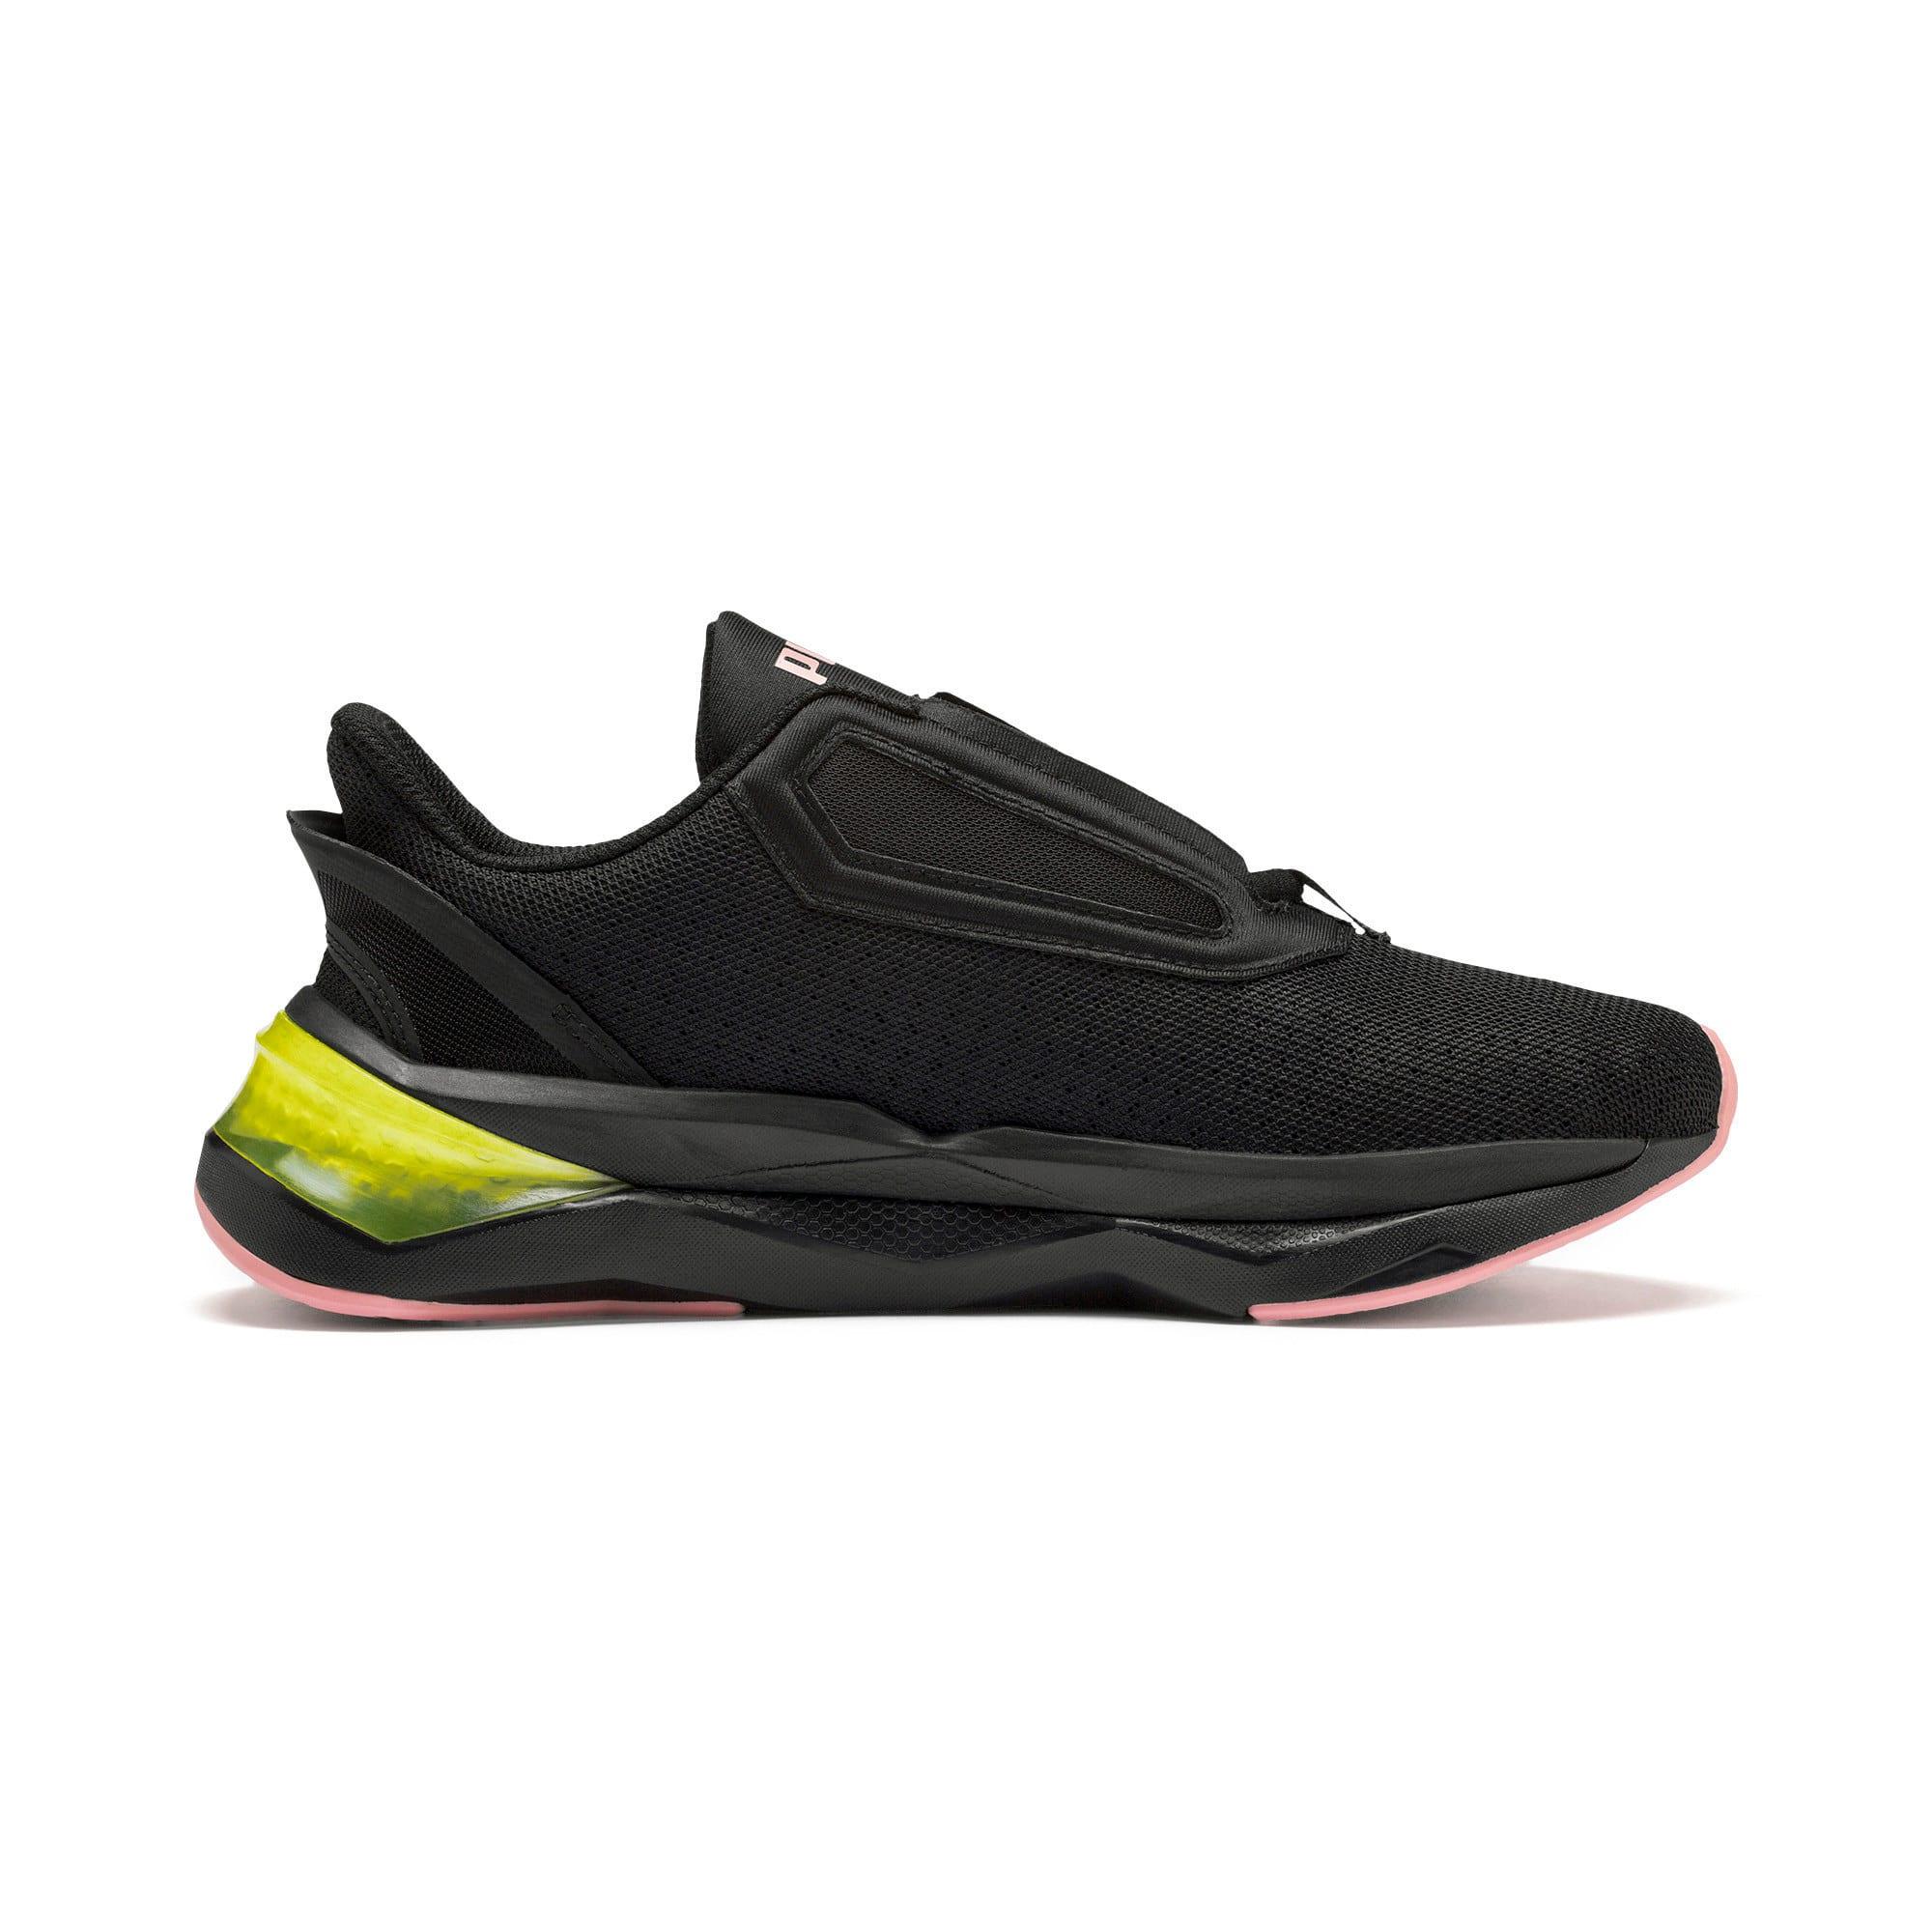 Thumbnail 5 of LQDCELL Shatter XT Women's Training Shoes, Puma Black-Yellow Alert, medium-IND